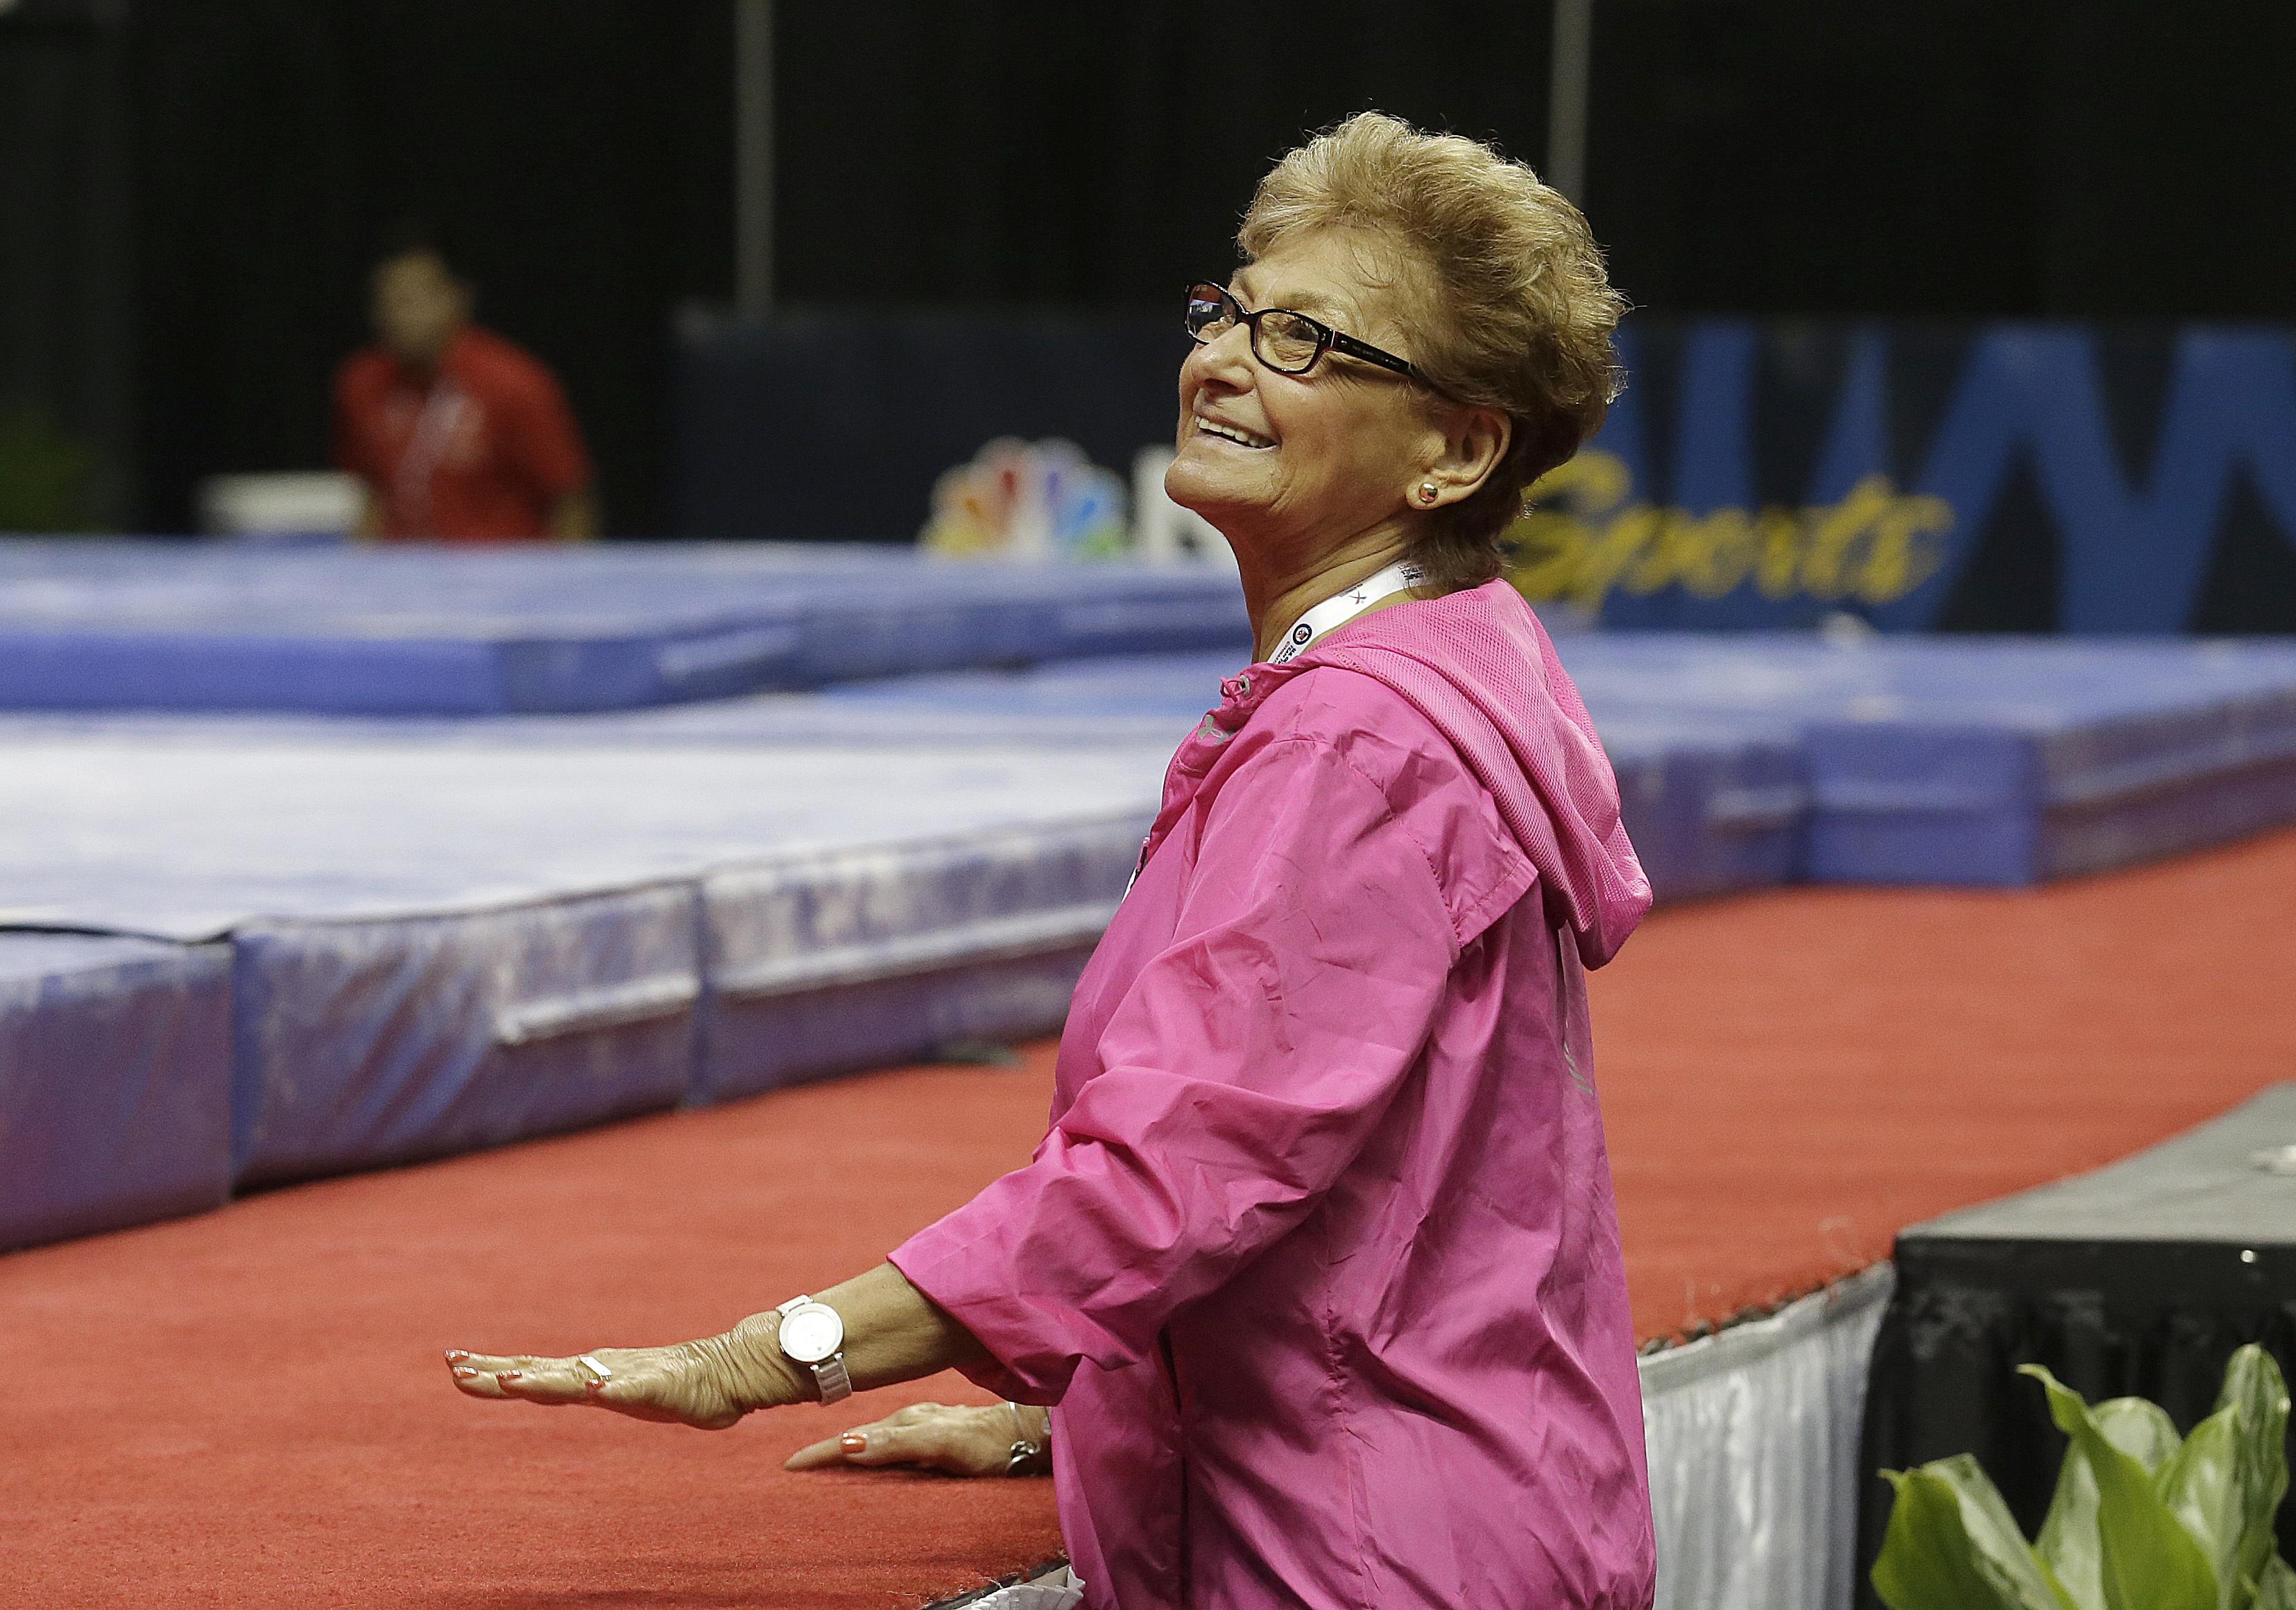 Marta Karolyi, national team coordinator for USA Gymnastics, smiles during practice at the U.S. Olympic trials in gymnastics in San Jose, Calif., Thursday, July 7, 2016. (AP Photo/Jeff Chiu)